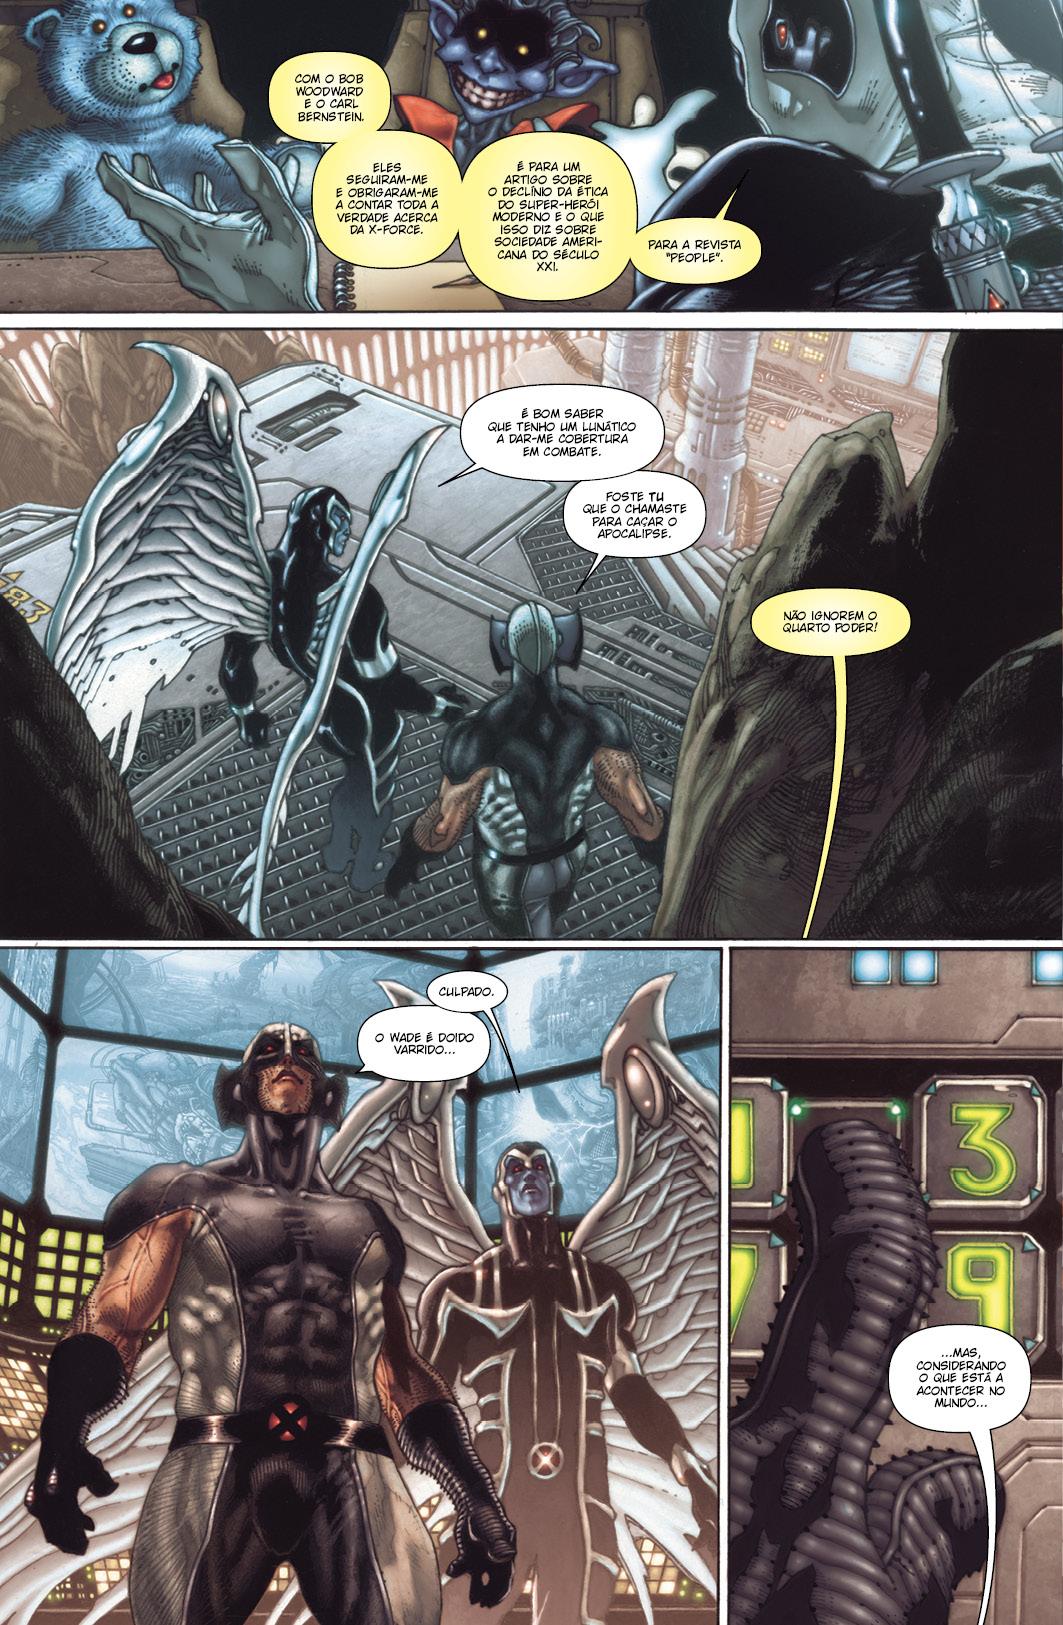 UNCANNY X-FORCE Vol. 3: EXTRAMUNDO